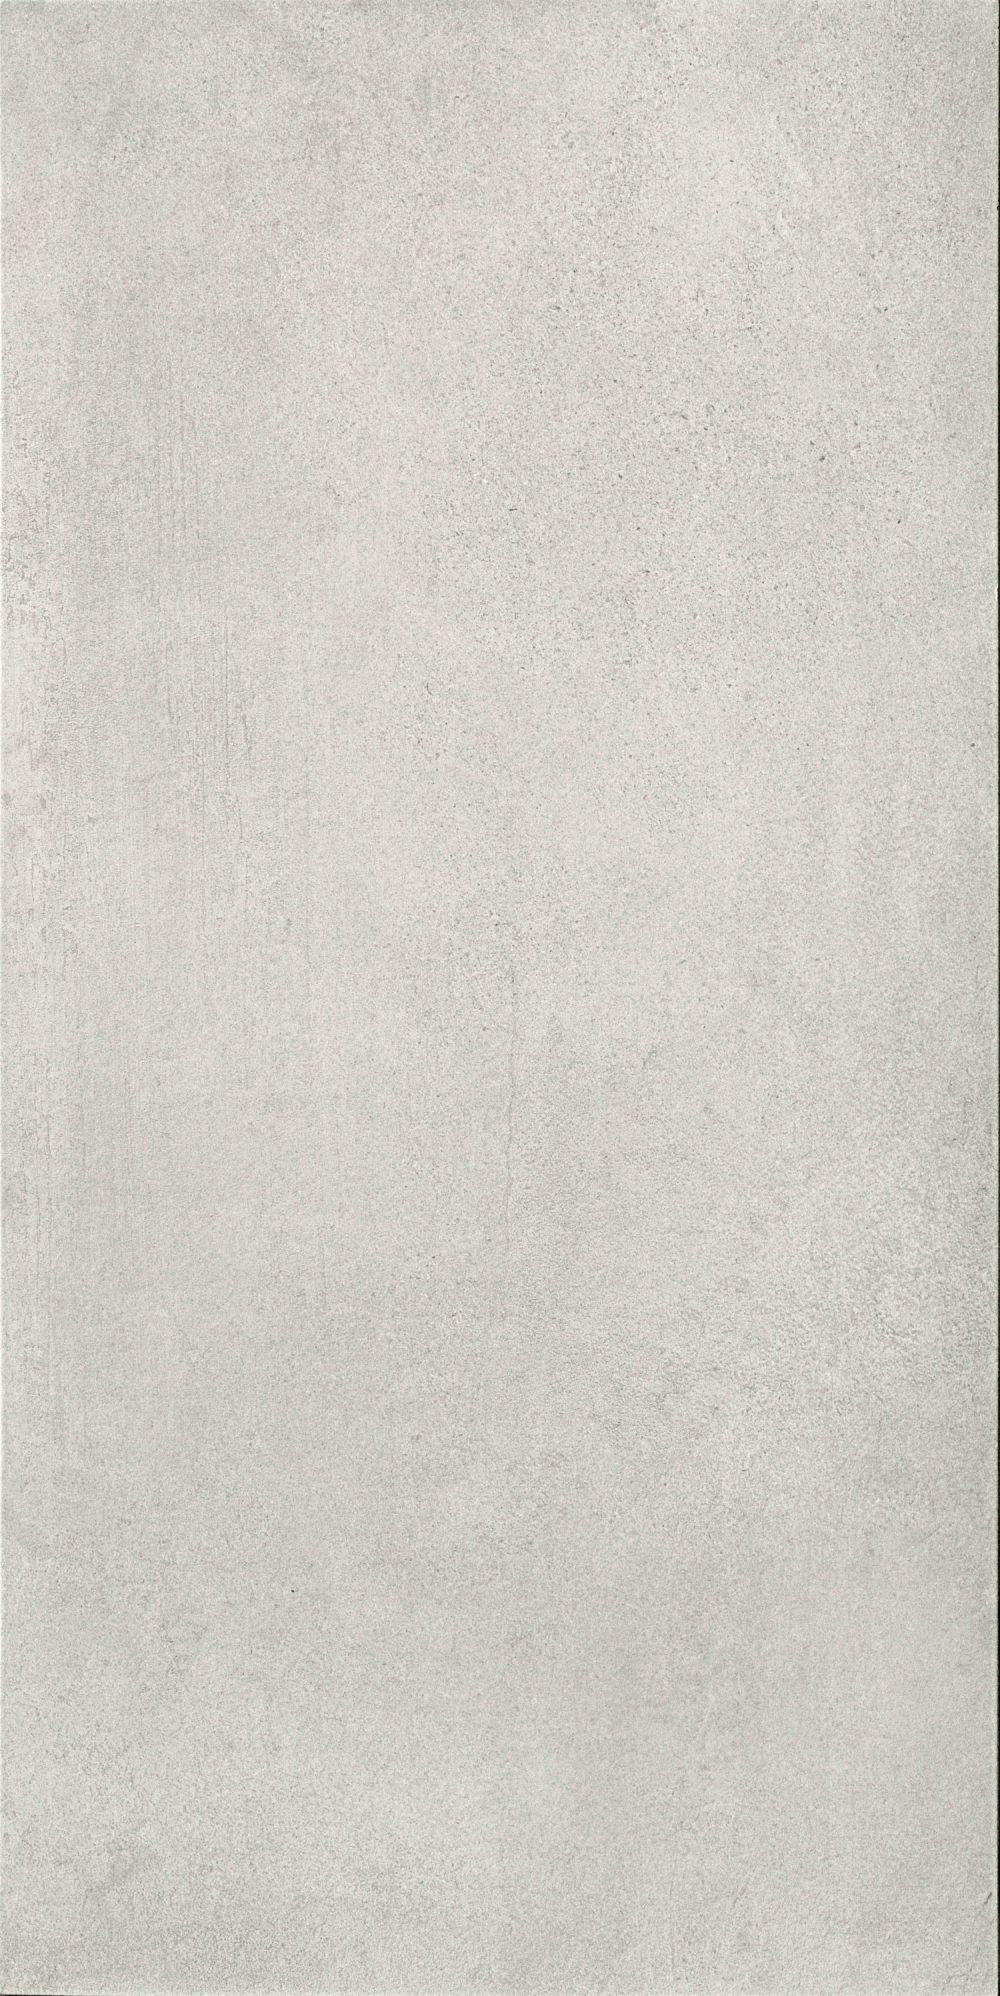 Cemento Bianco Tiles